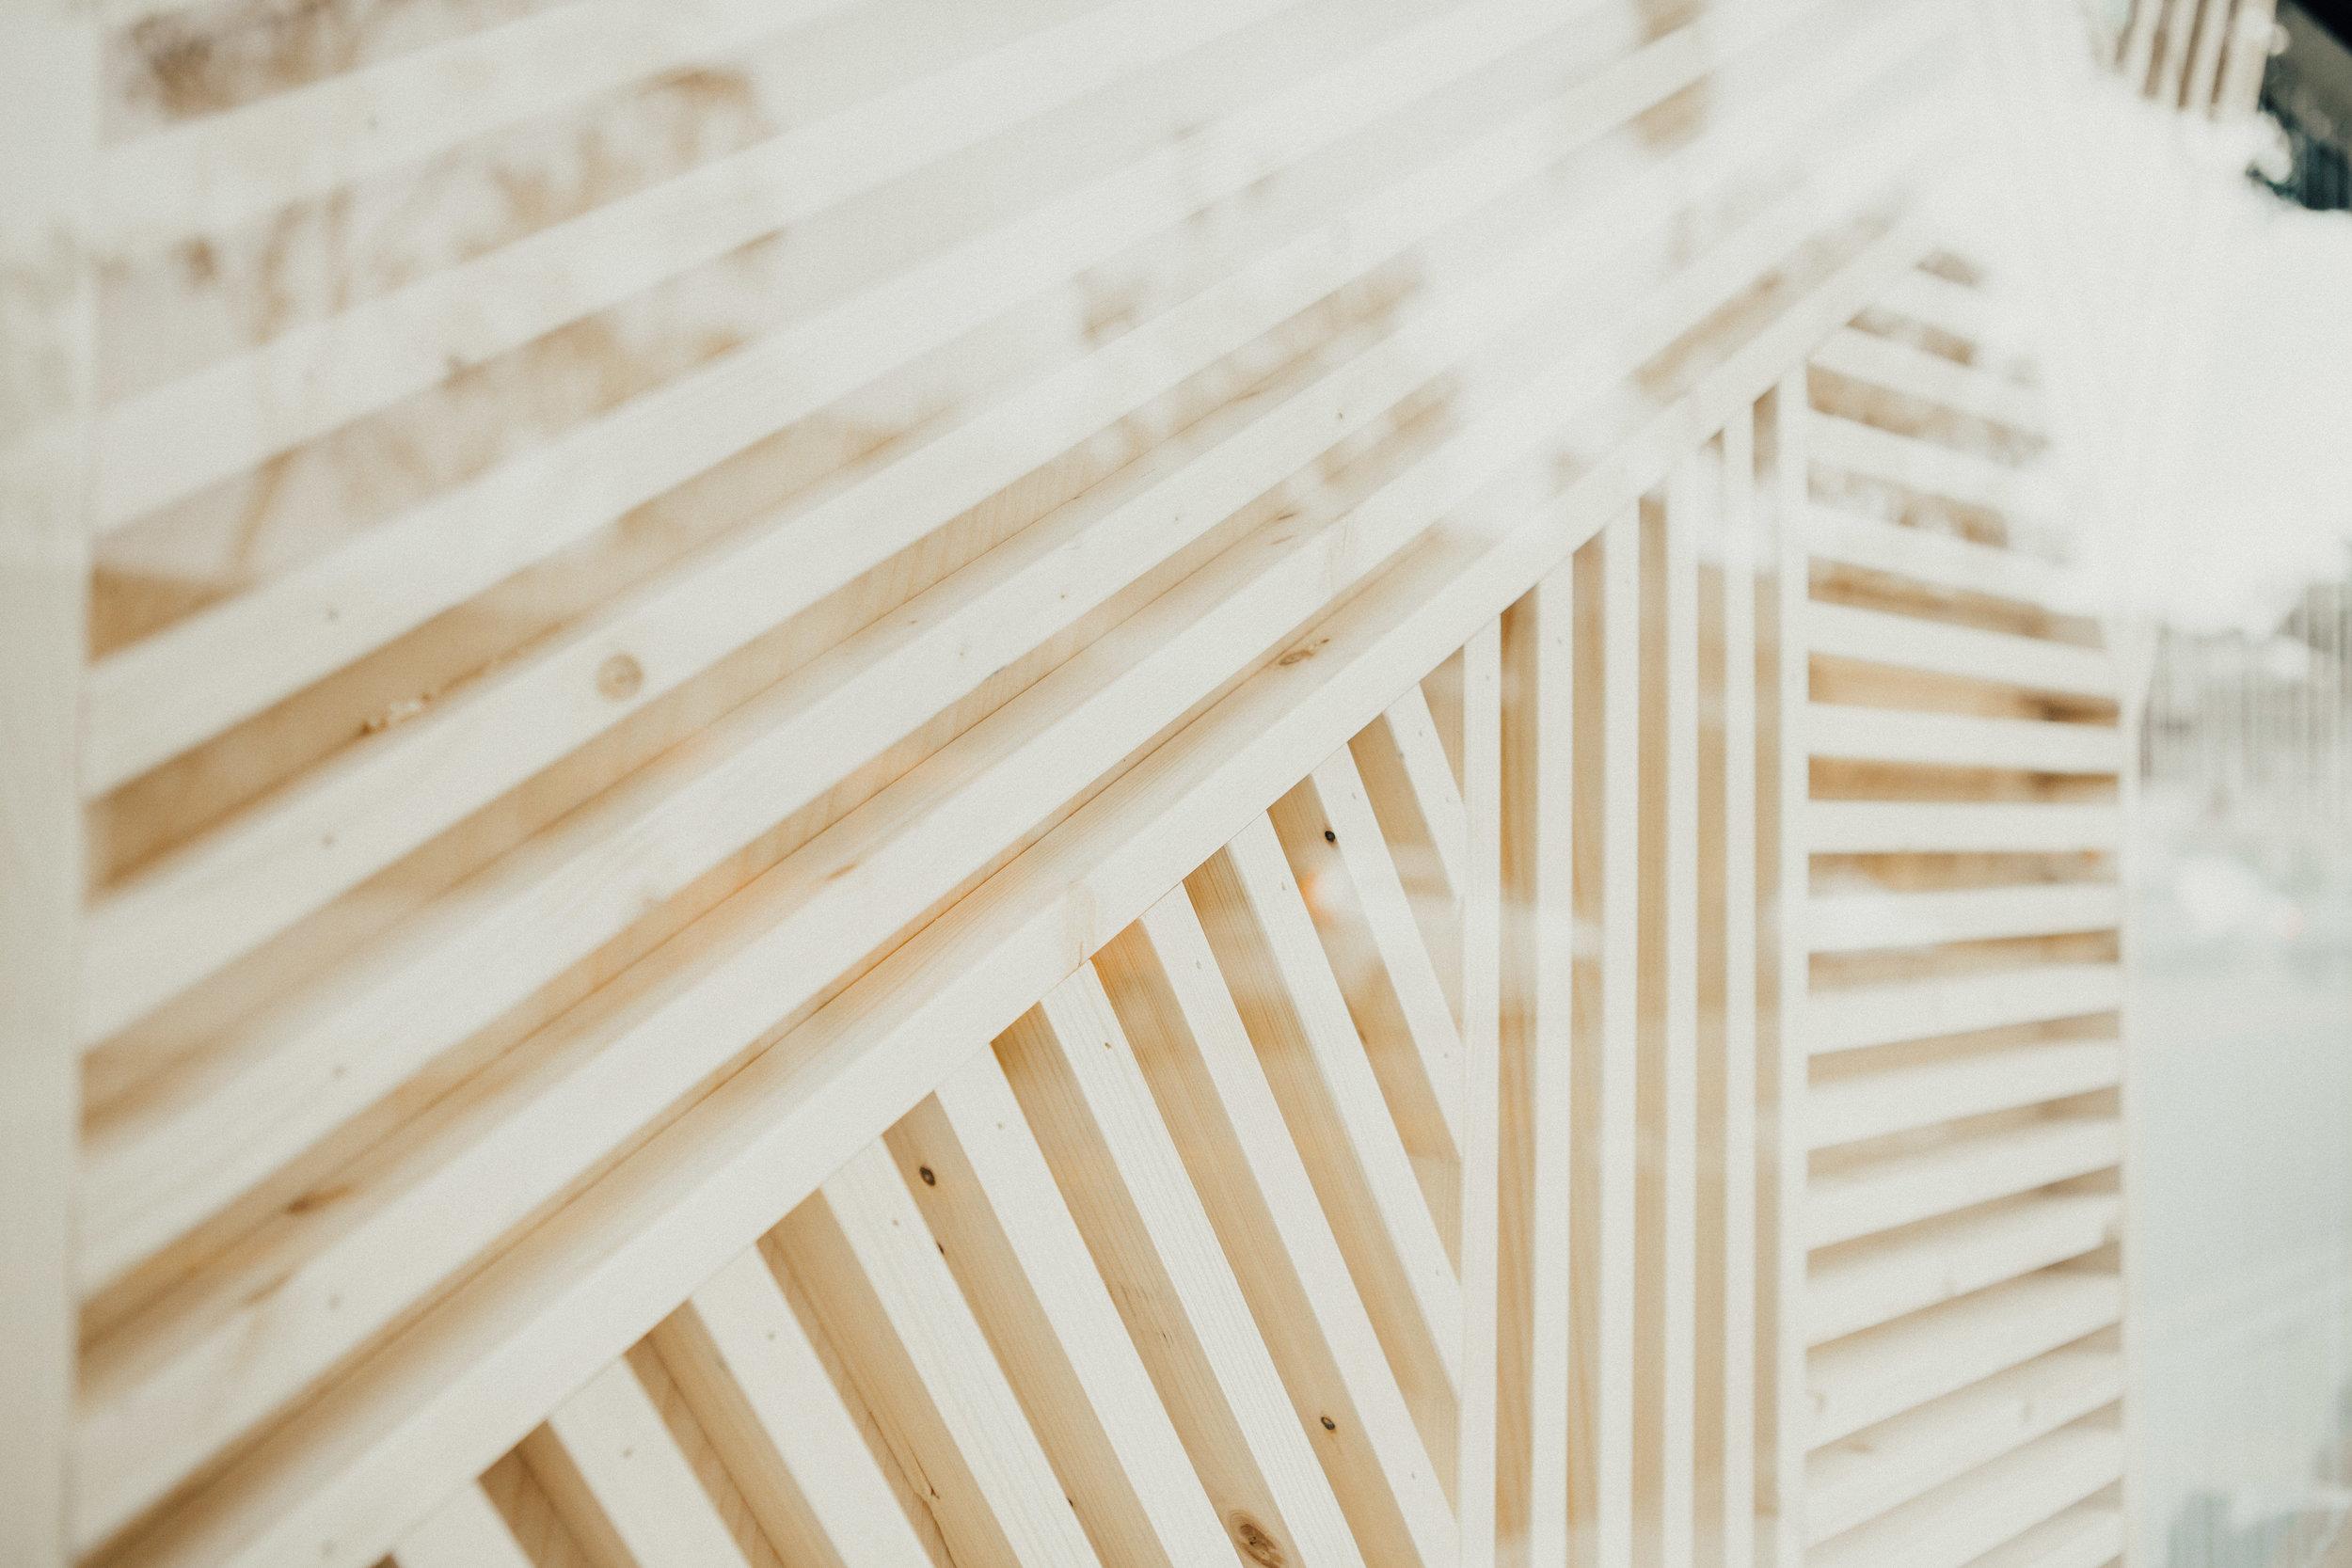 Amuse Society Window Display | Relevant + Raw Installation | @RelevantRaw